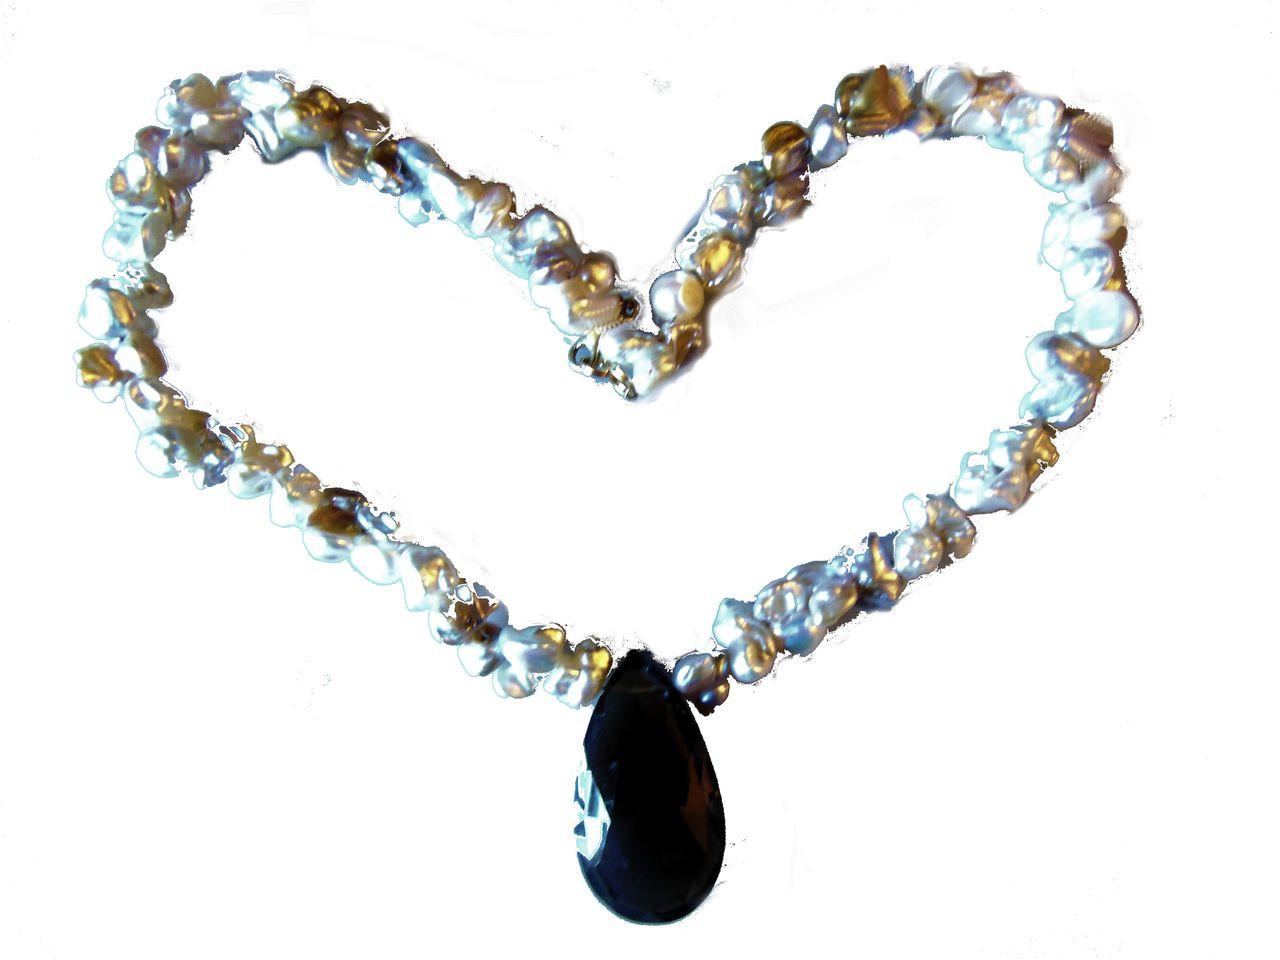 Smoky briolette on crazy keshi pearls